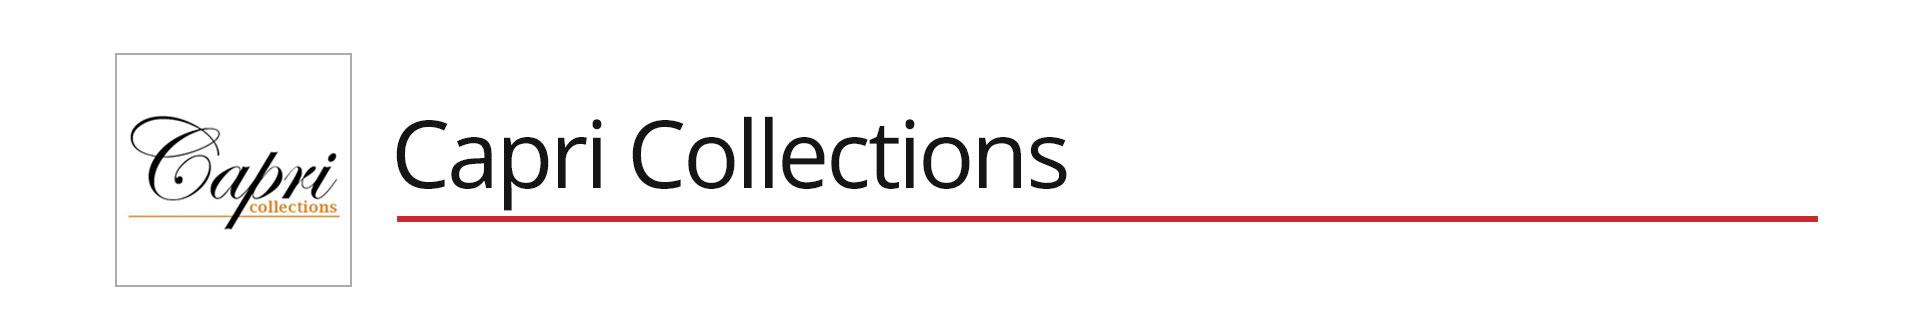 Capri-Collections_CADBlock-Header.jpg